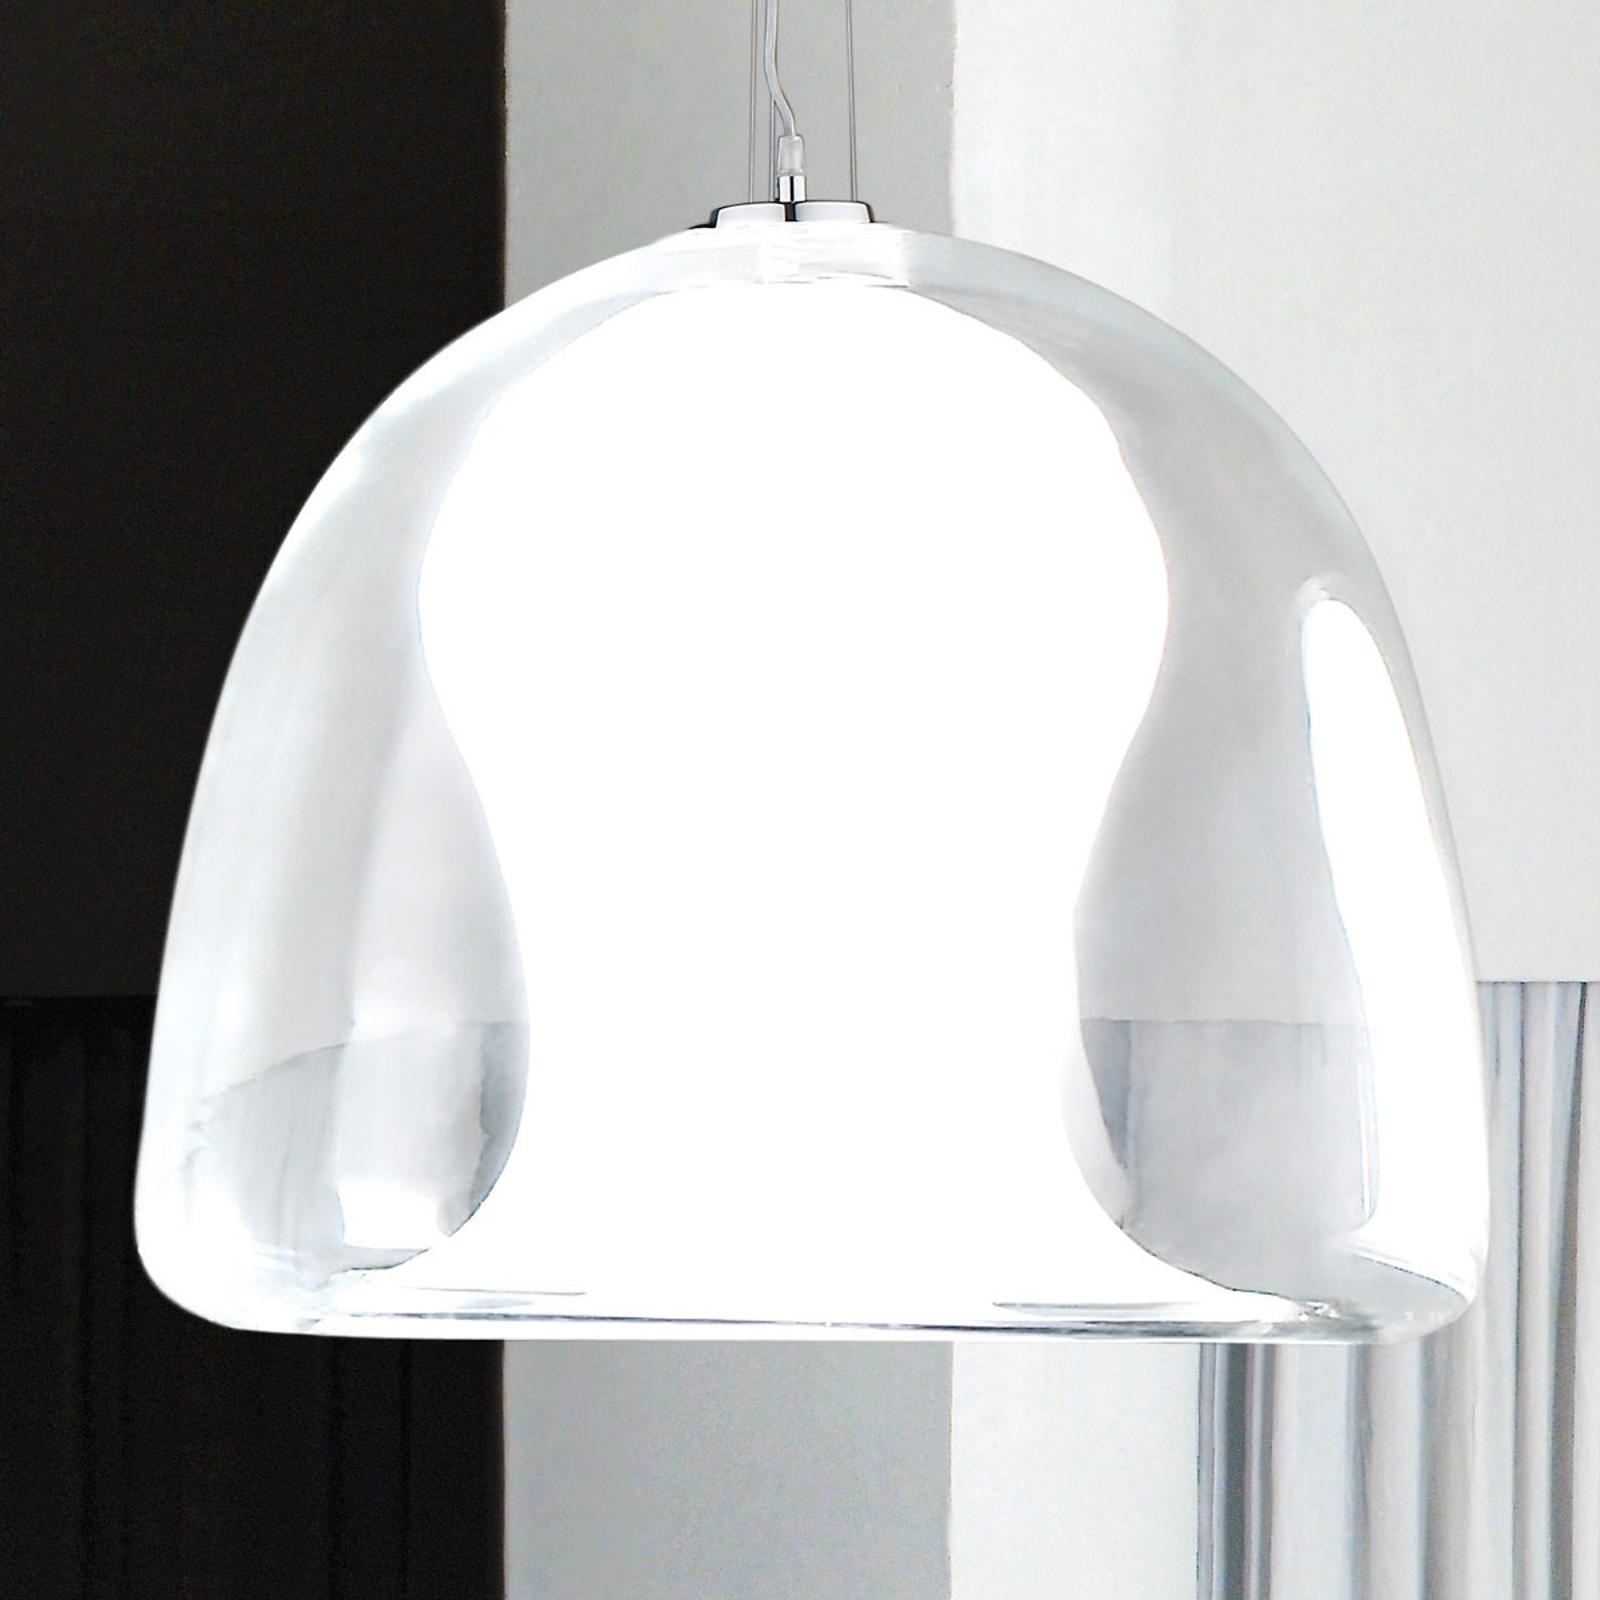 Lampa wisząca Naranza, kryształ, Ø 40 cm biała